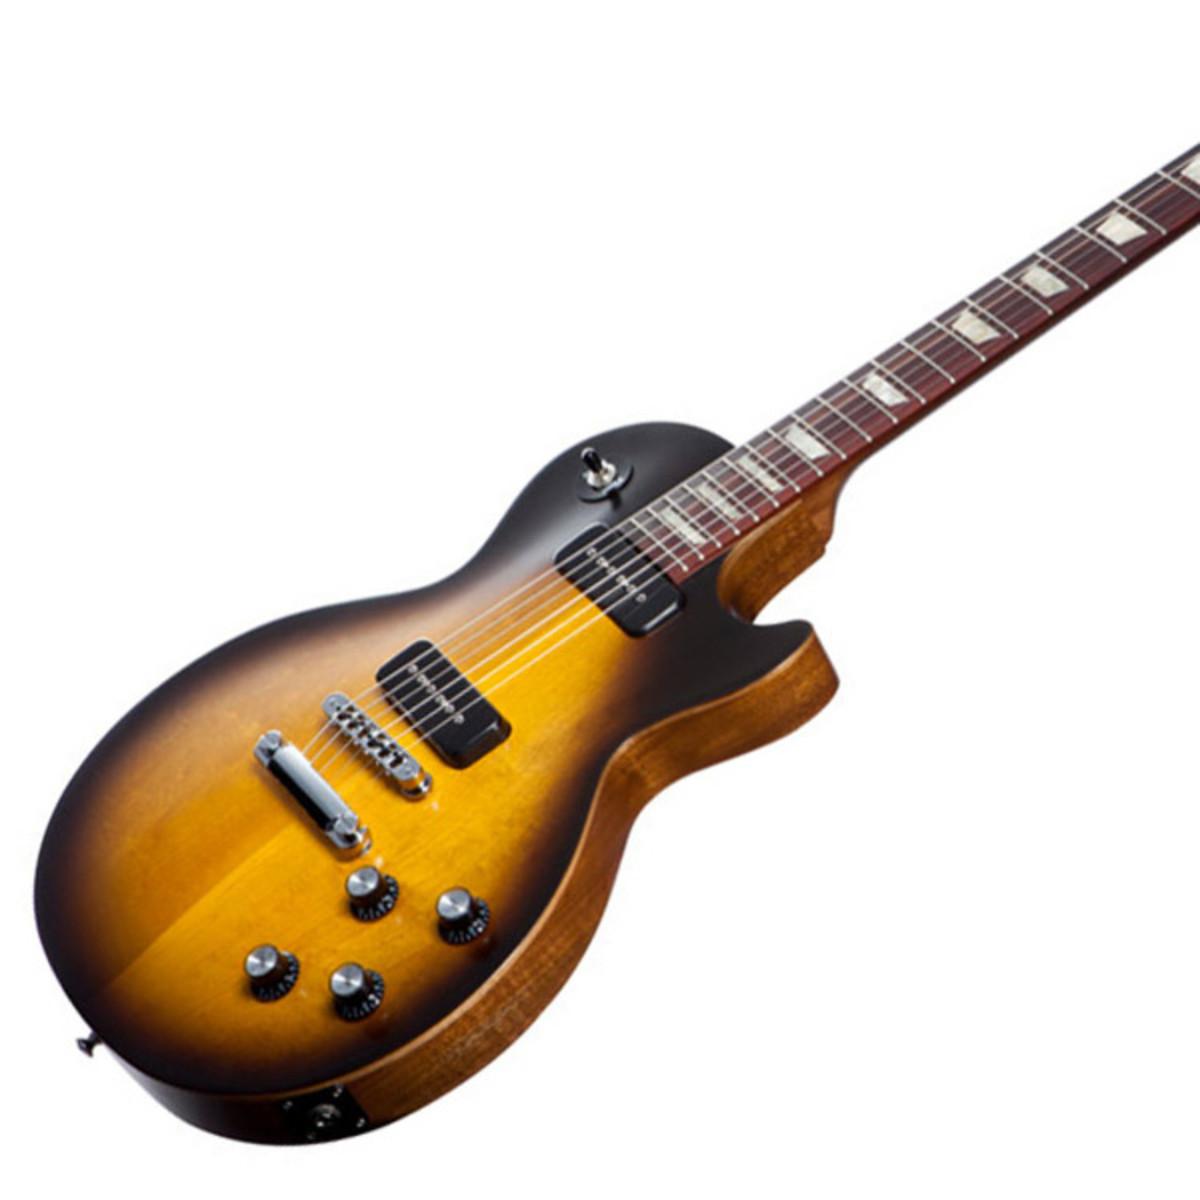 disc gibson les paul 50s tribute electric guitar vintage sunburst at gear4music. Black Bedroom Furniture Sets. Home Design Ideas